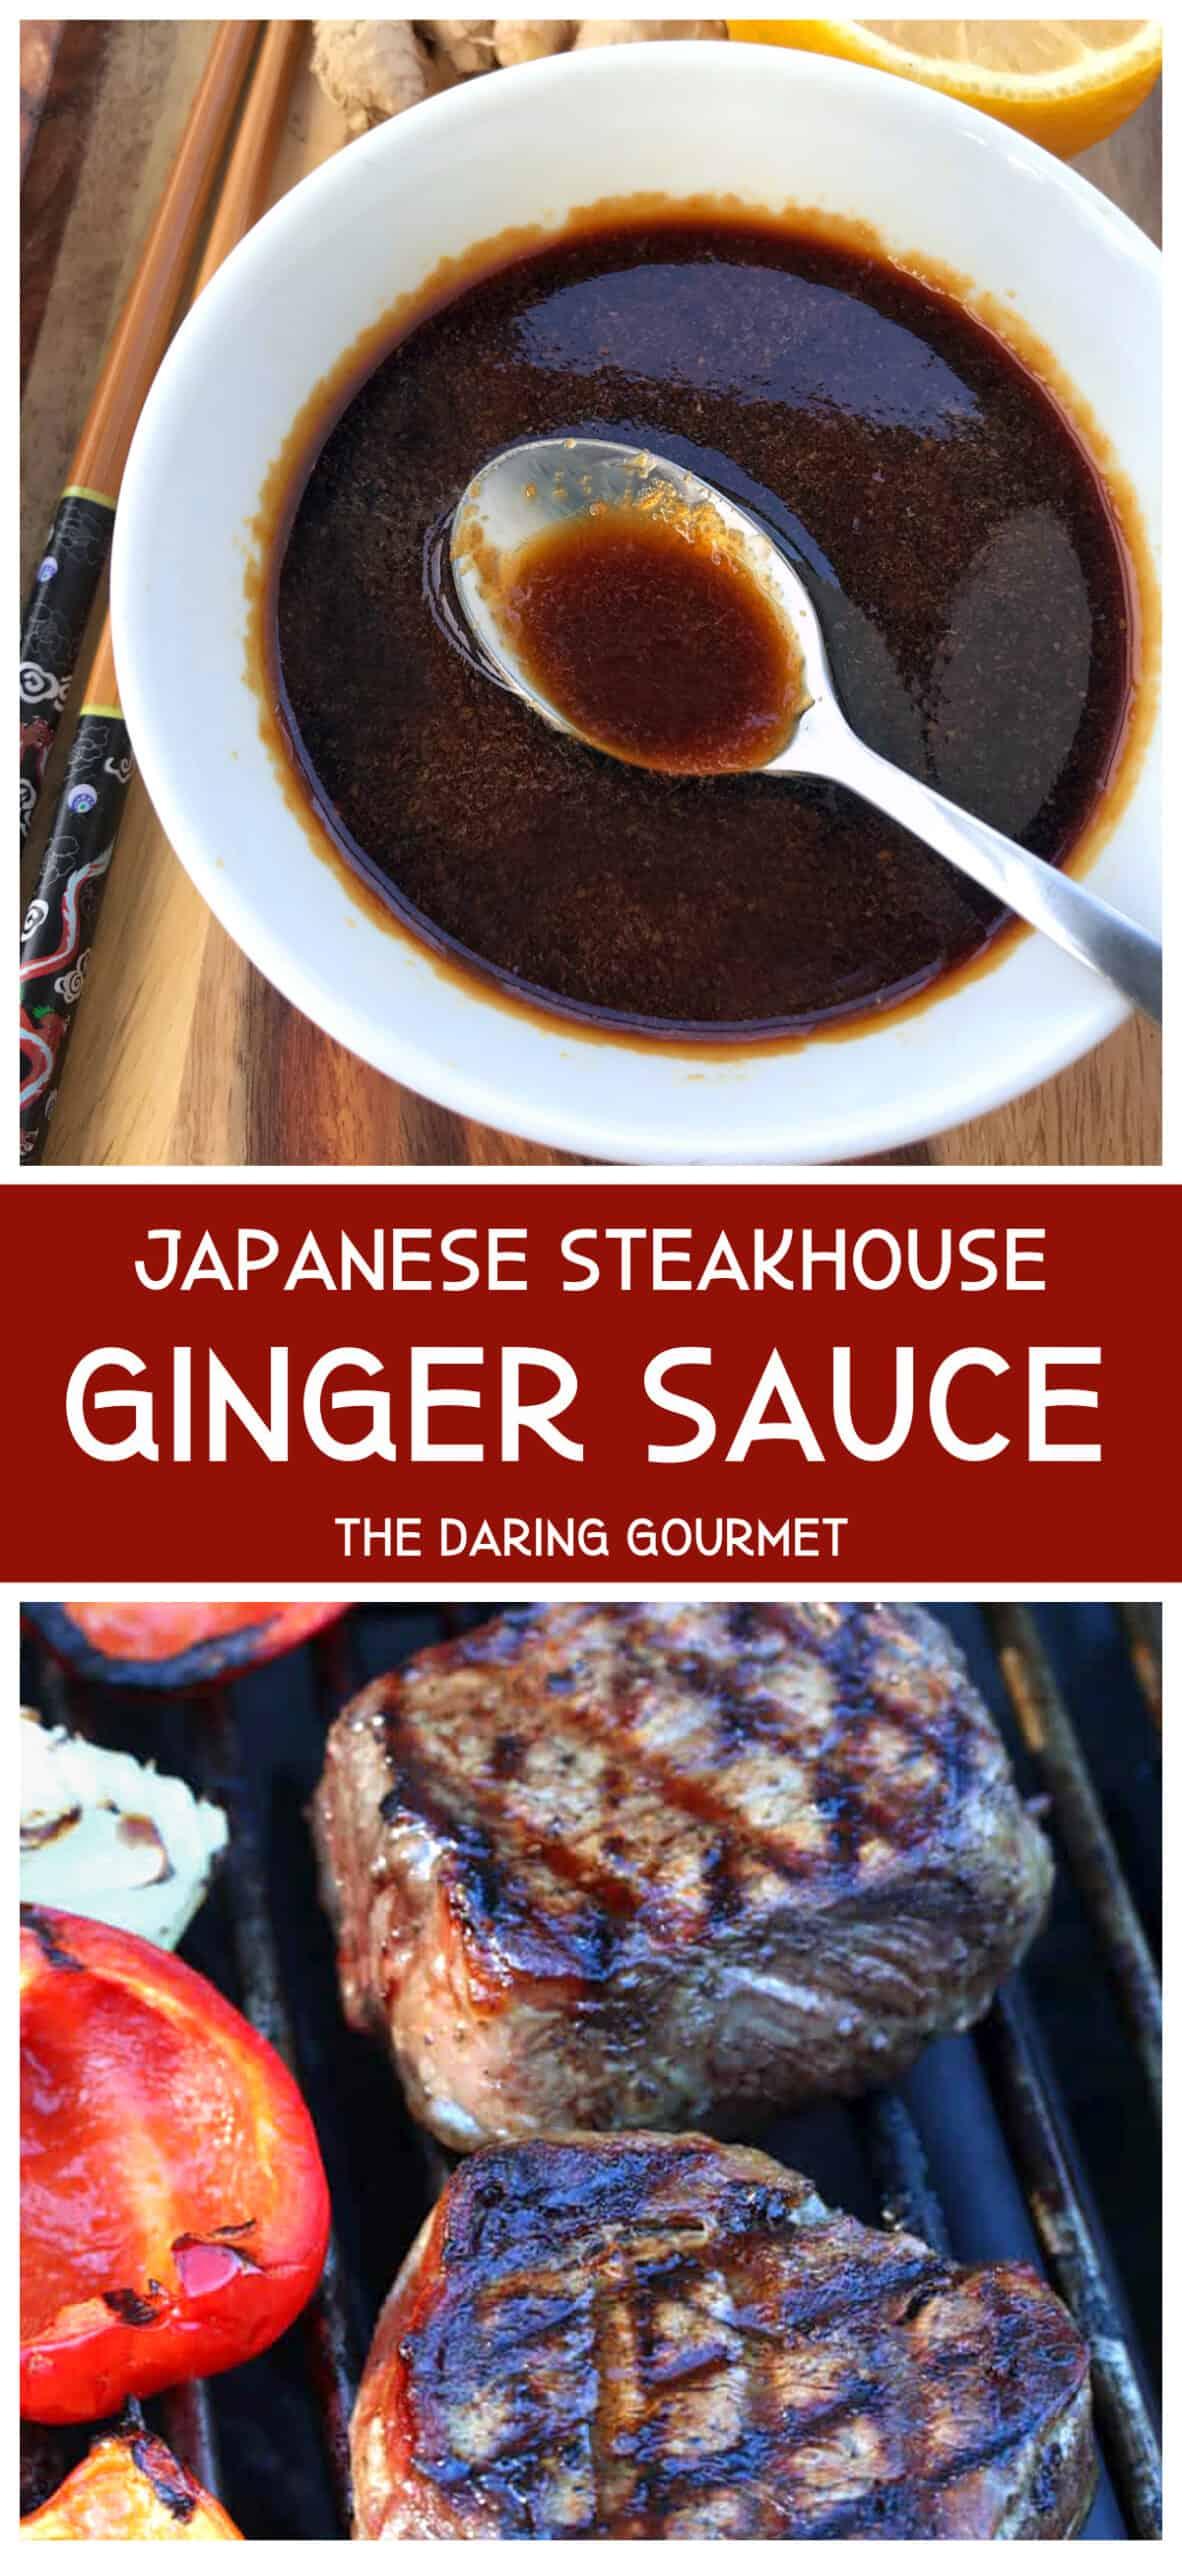 ginger sauce recipe benihana copycat hibachi Japanese steakhouse dipping sushi